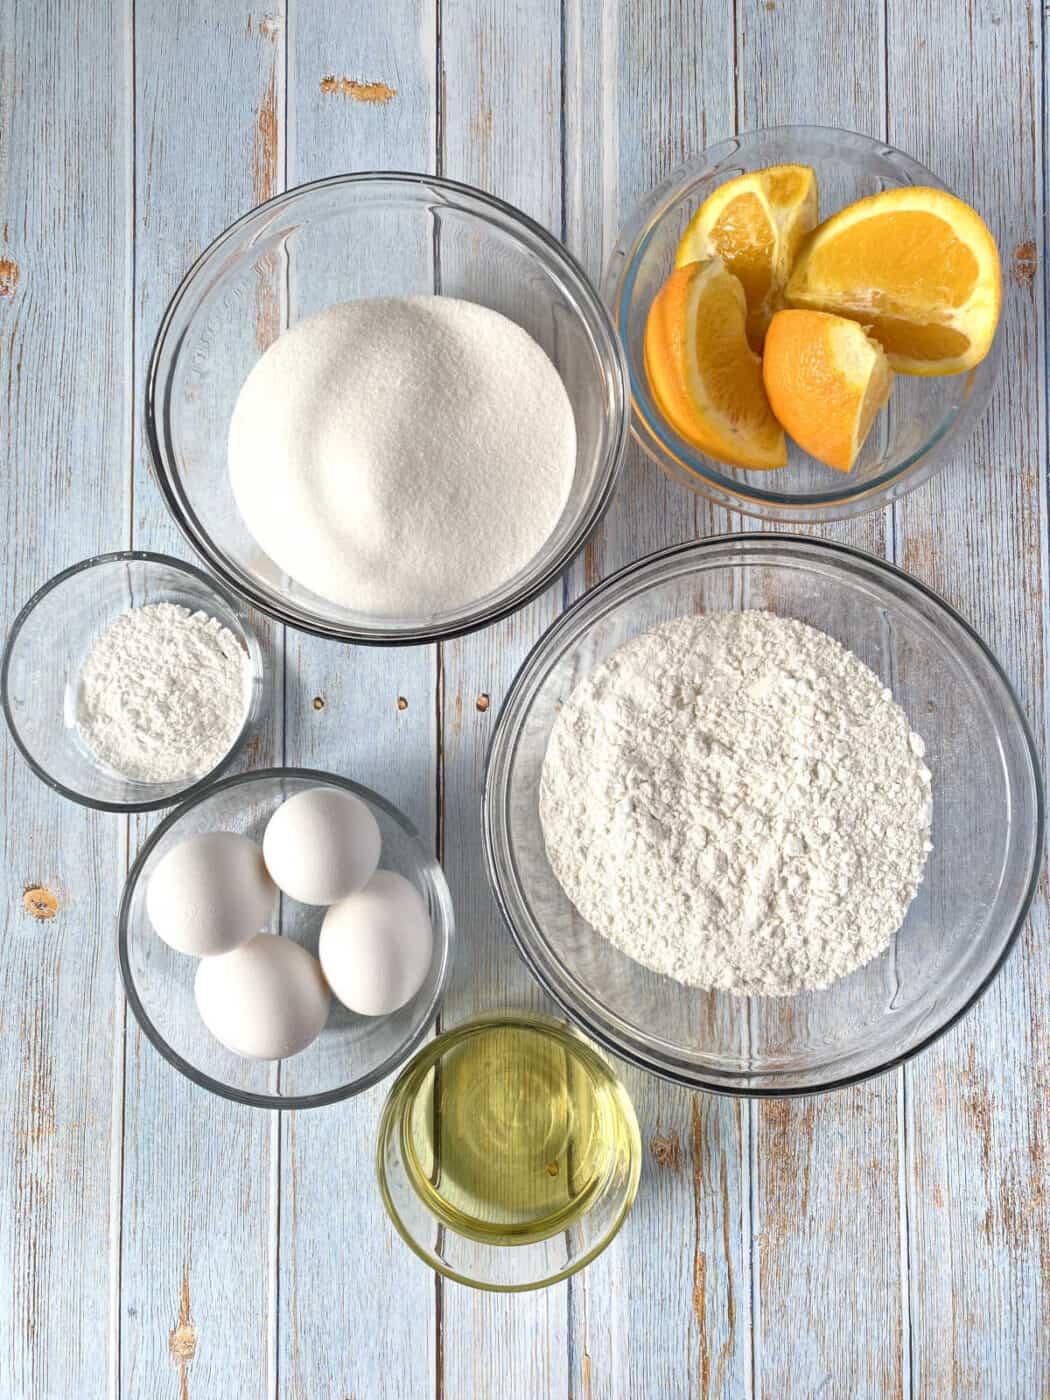 Orange wedges, flour, sugar, eggs, oils and baking powder in glass bowls